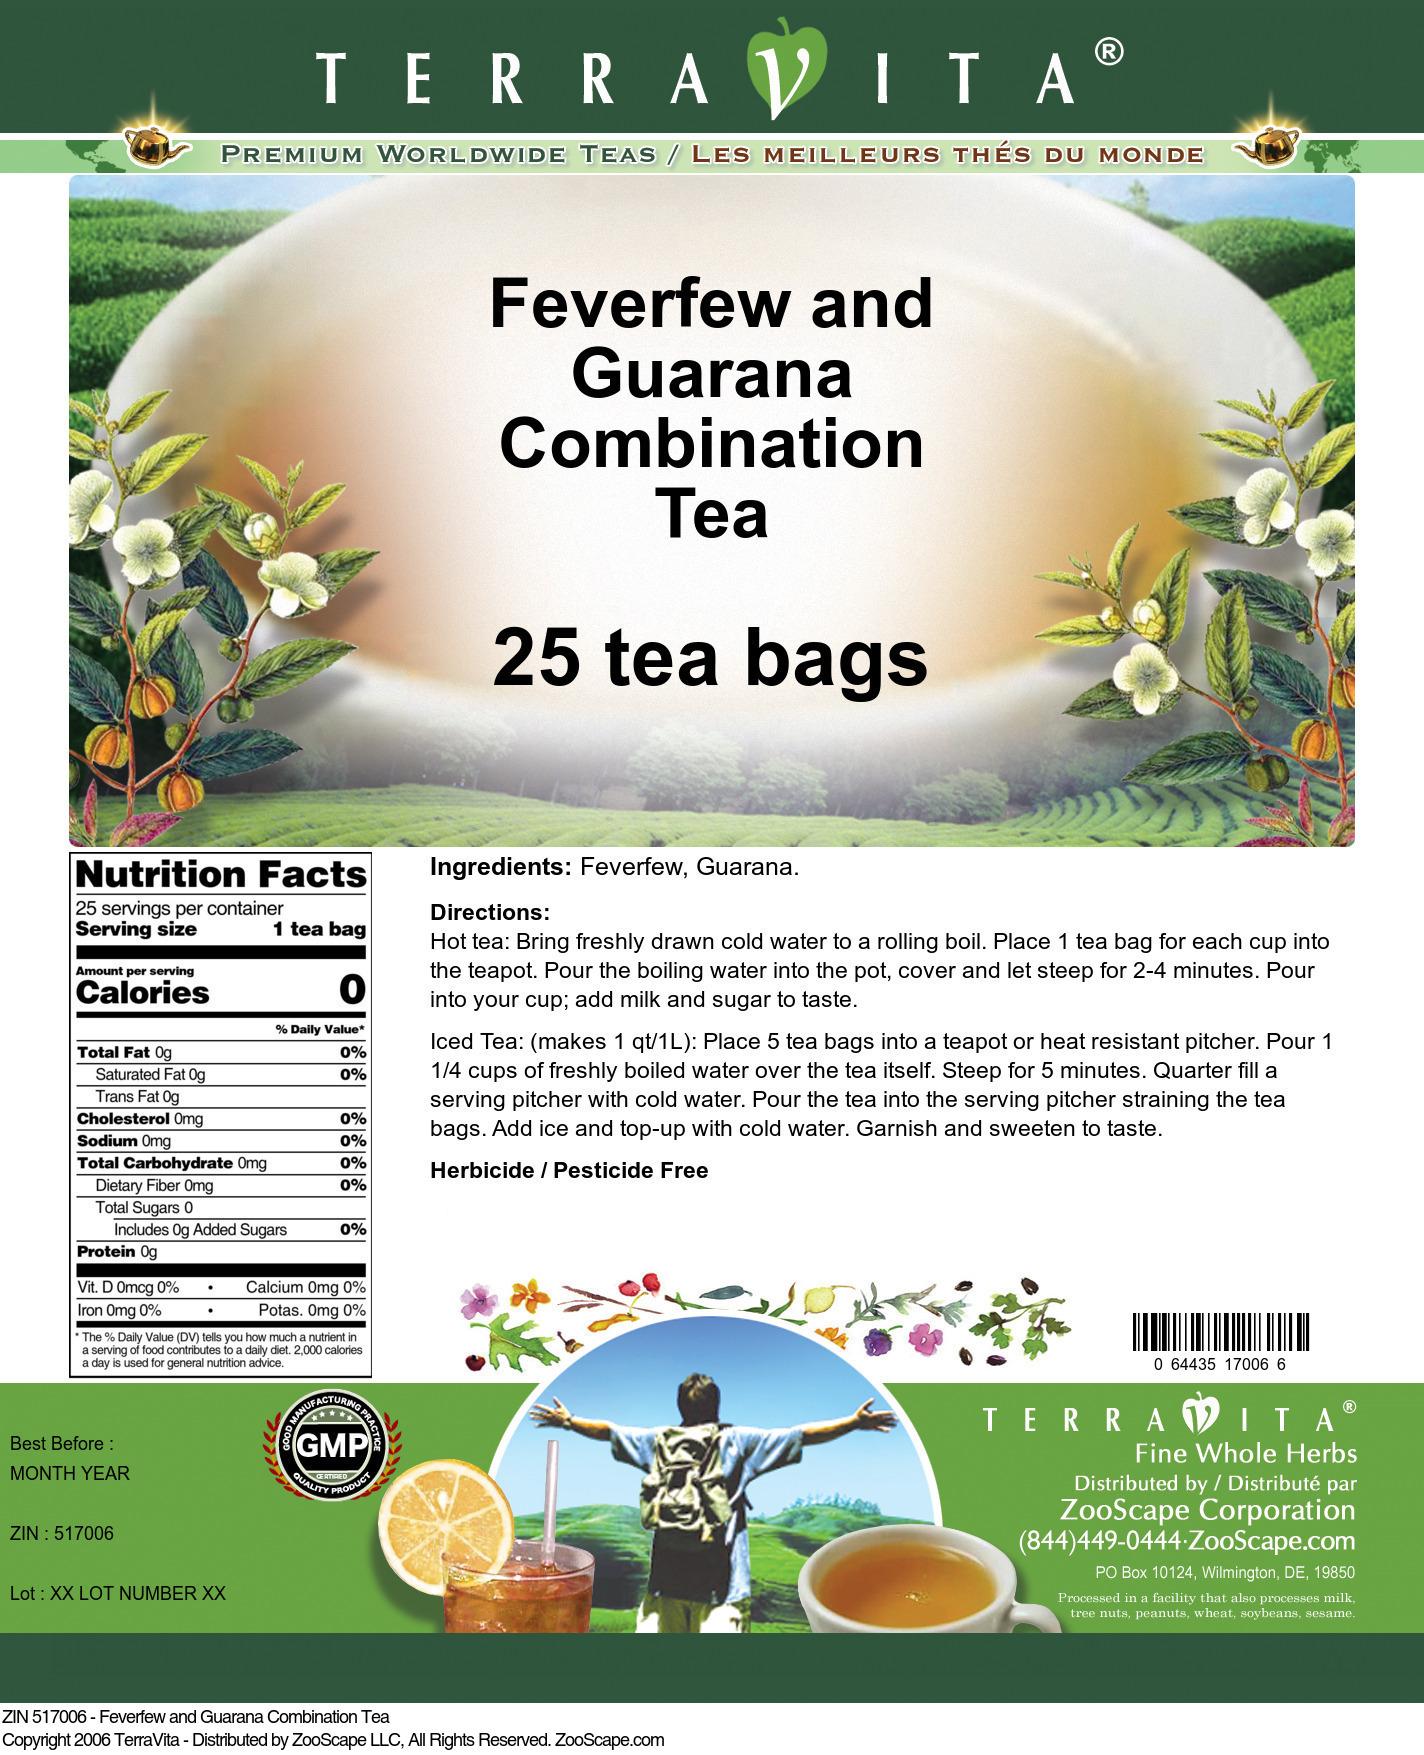 Feverfew and Guarana Combination Tea